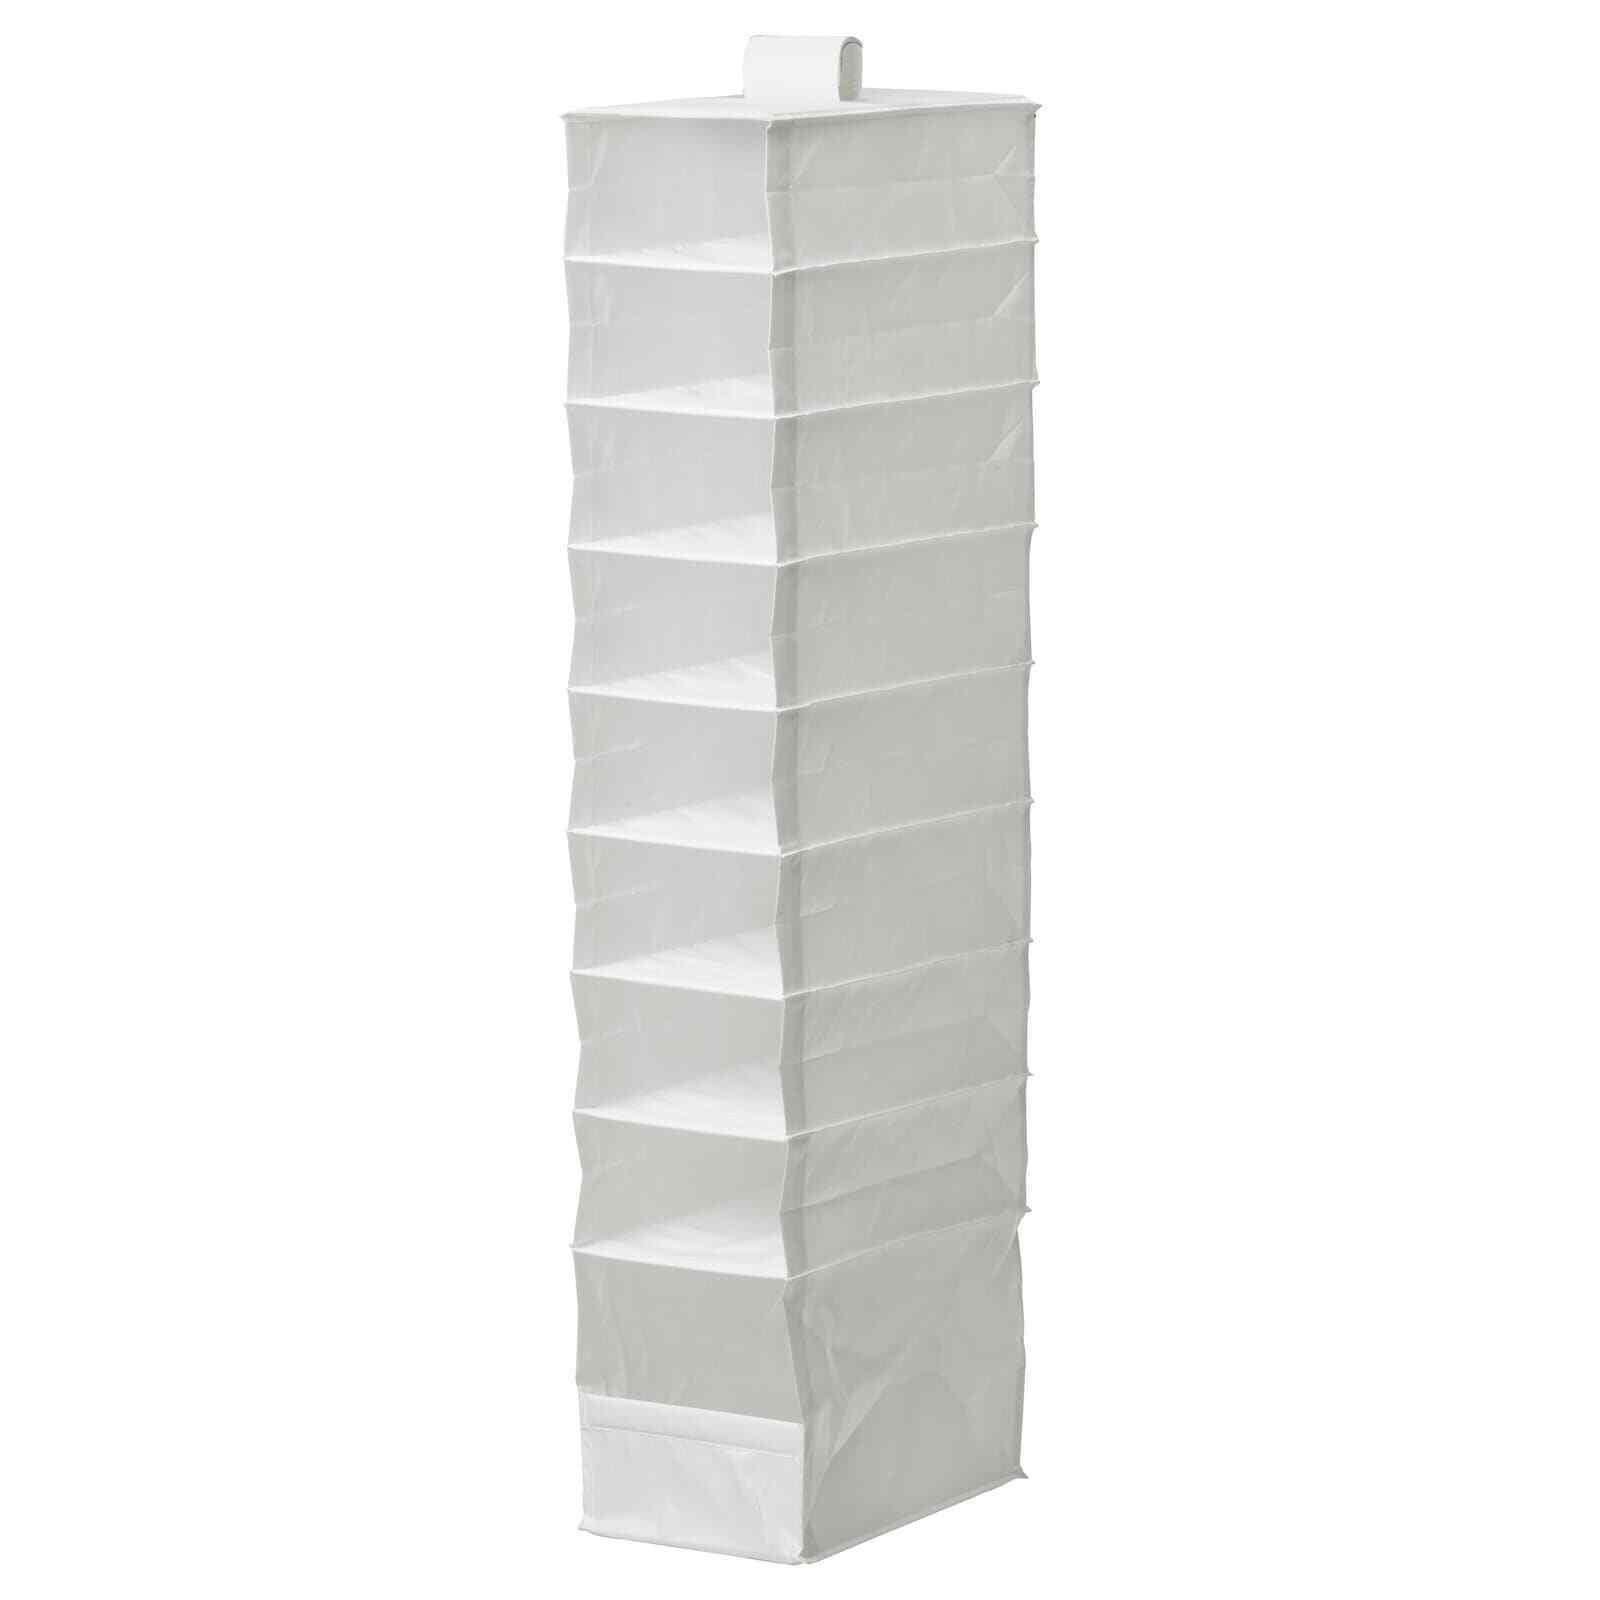 IKEA SKUBB Wardrobe Clothes Storage